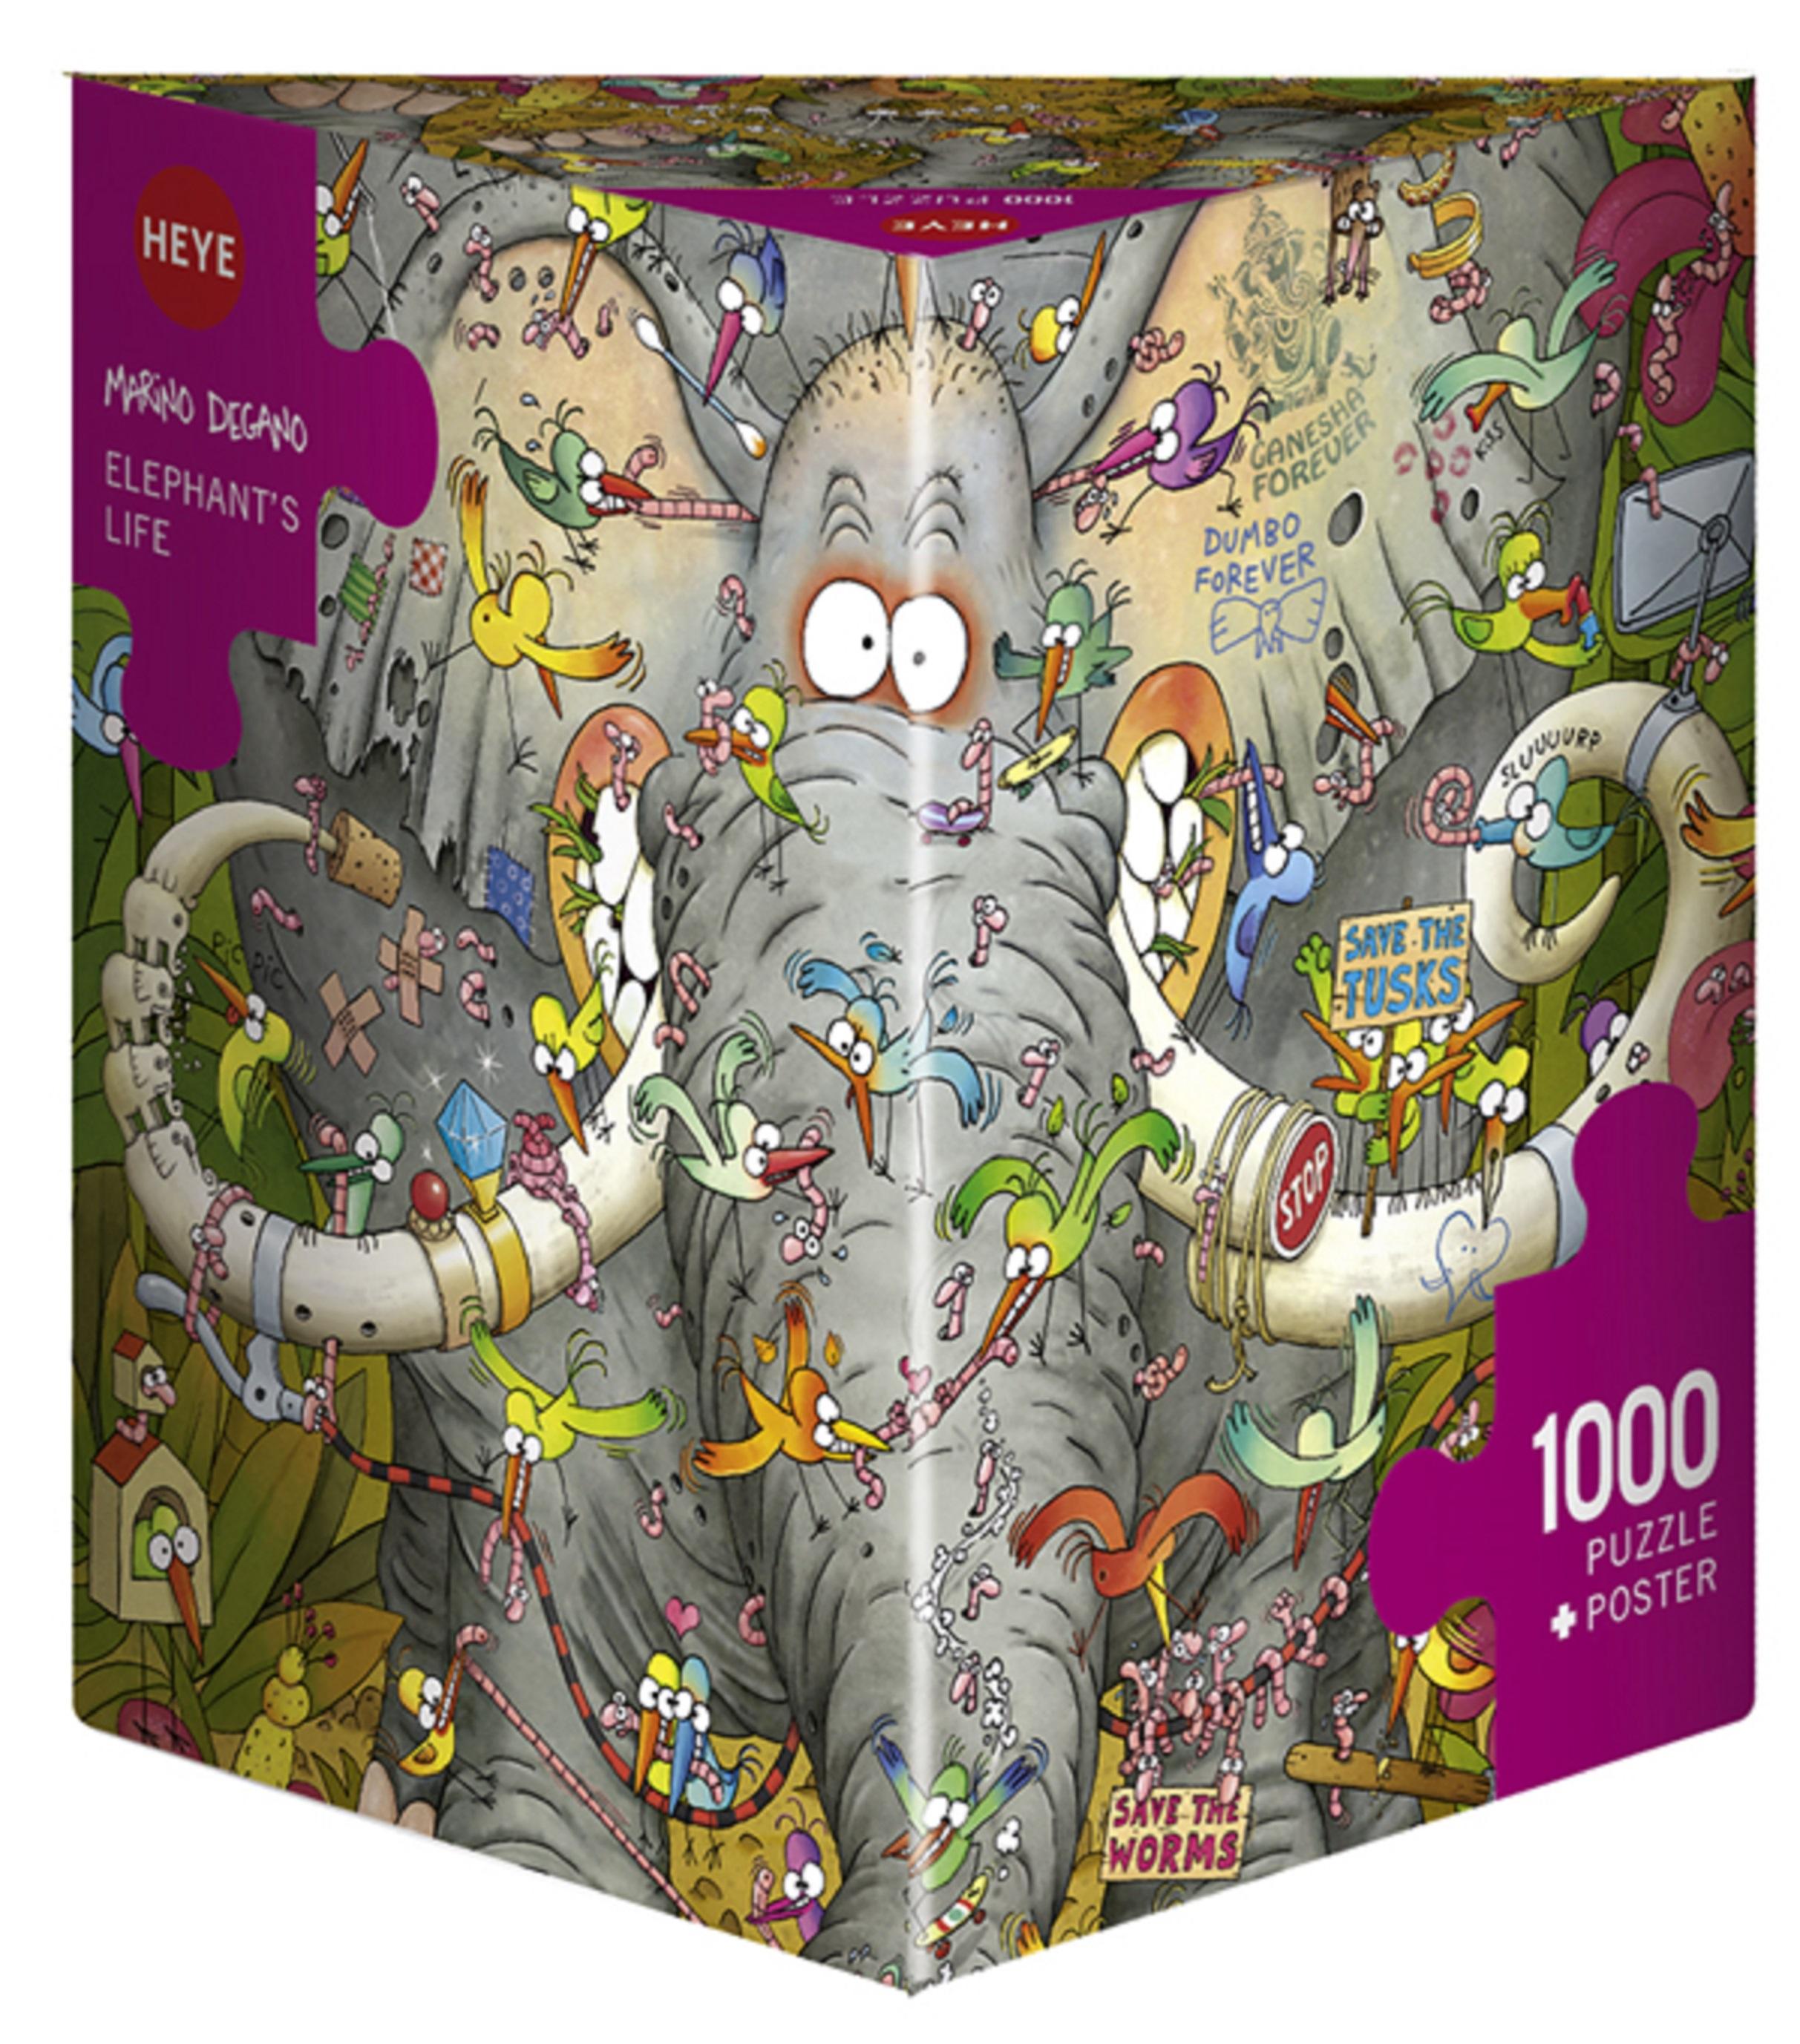 Puzzle 1000 piese - Viata elefantilor Degano | Heye